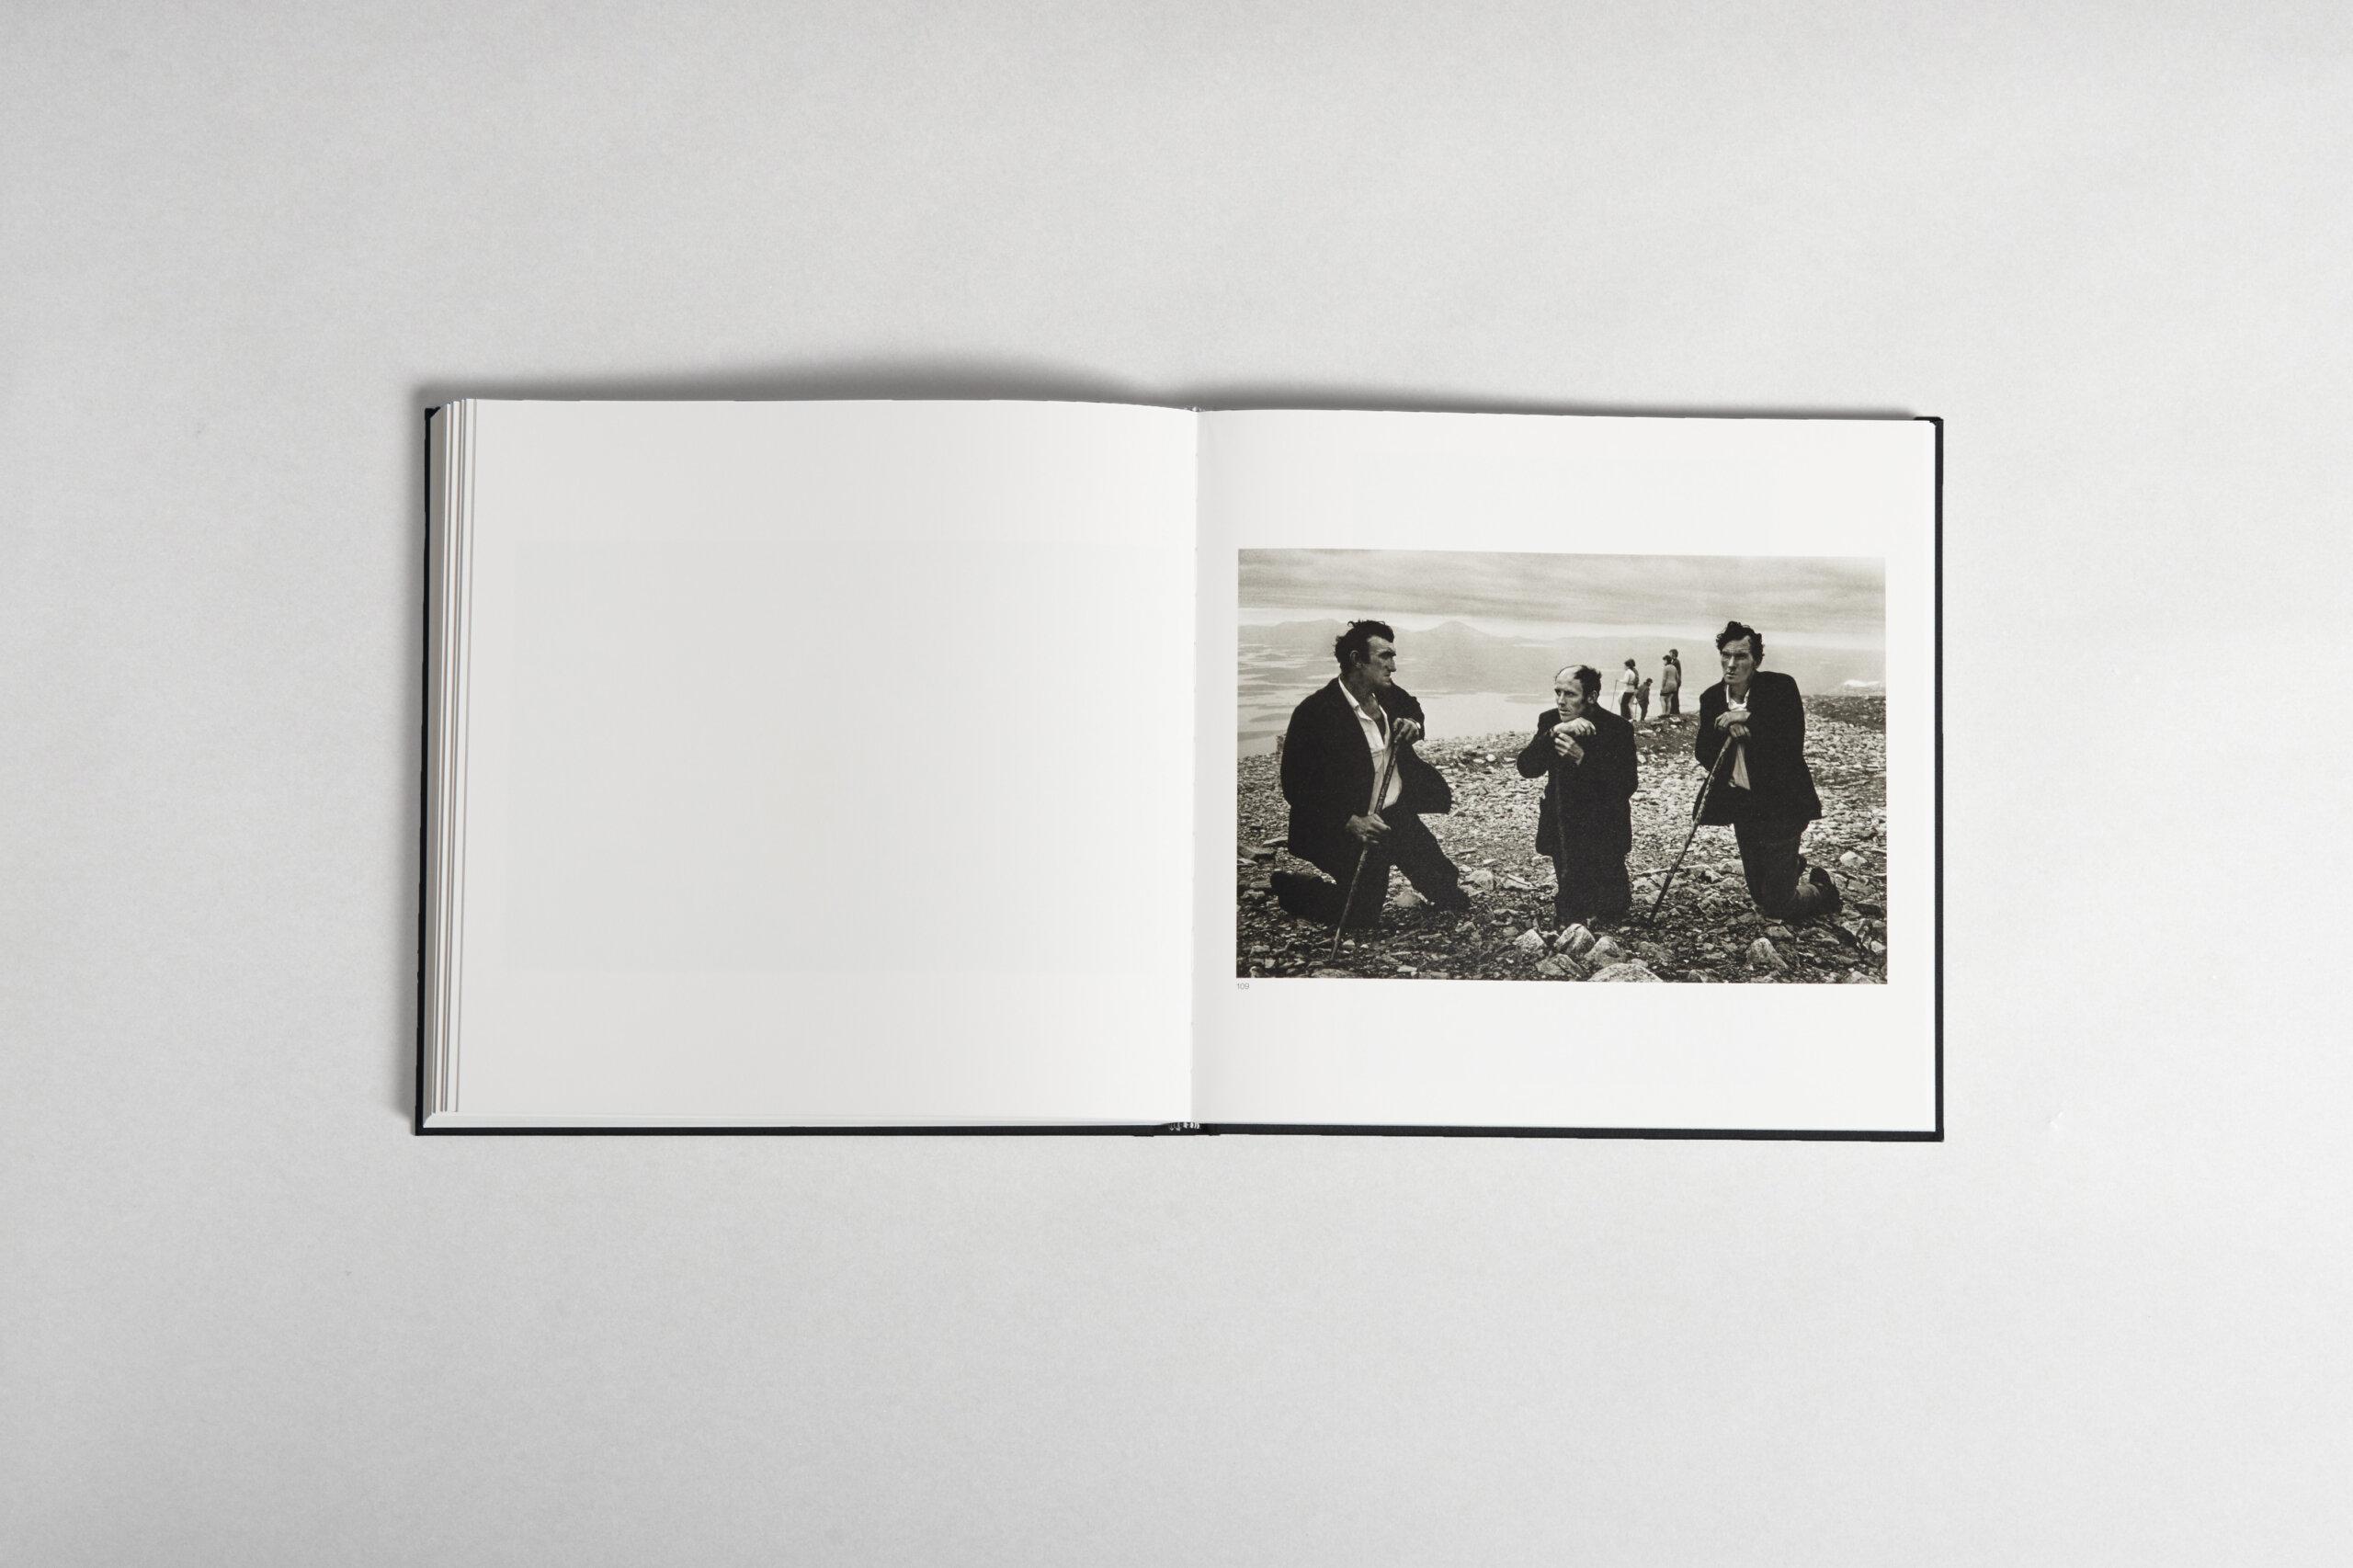 delpire-KOUDELKA-josef-koudelka